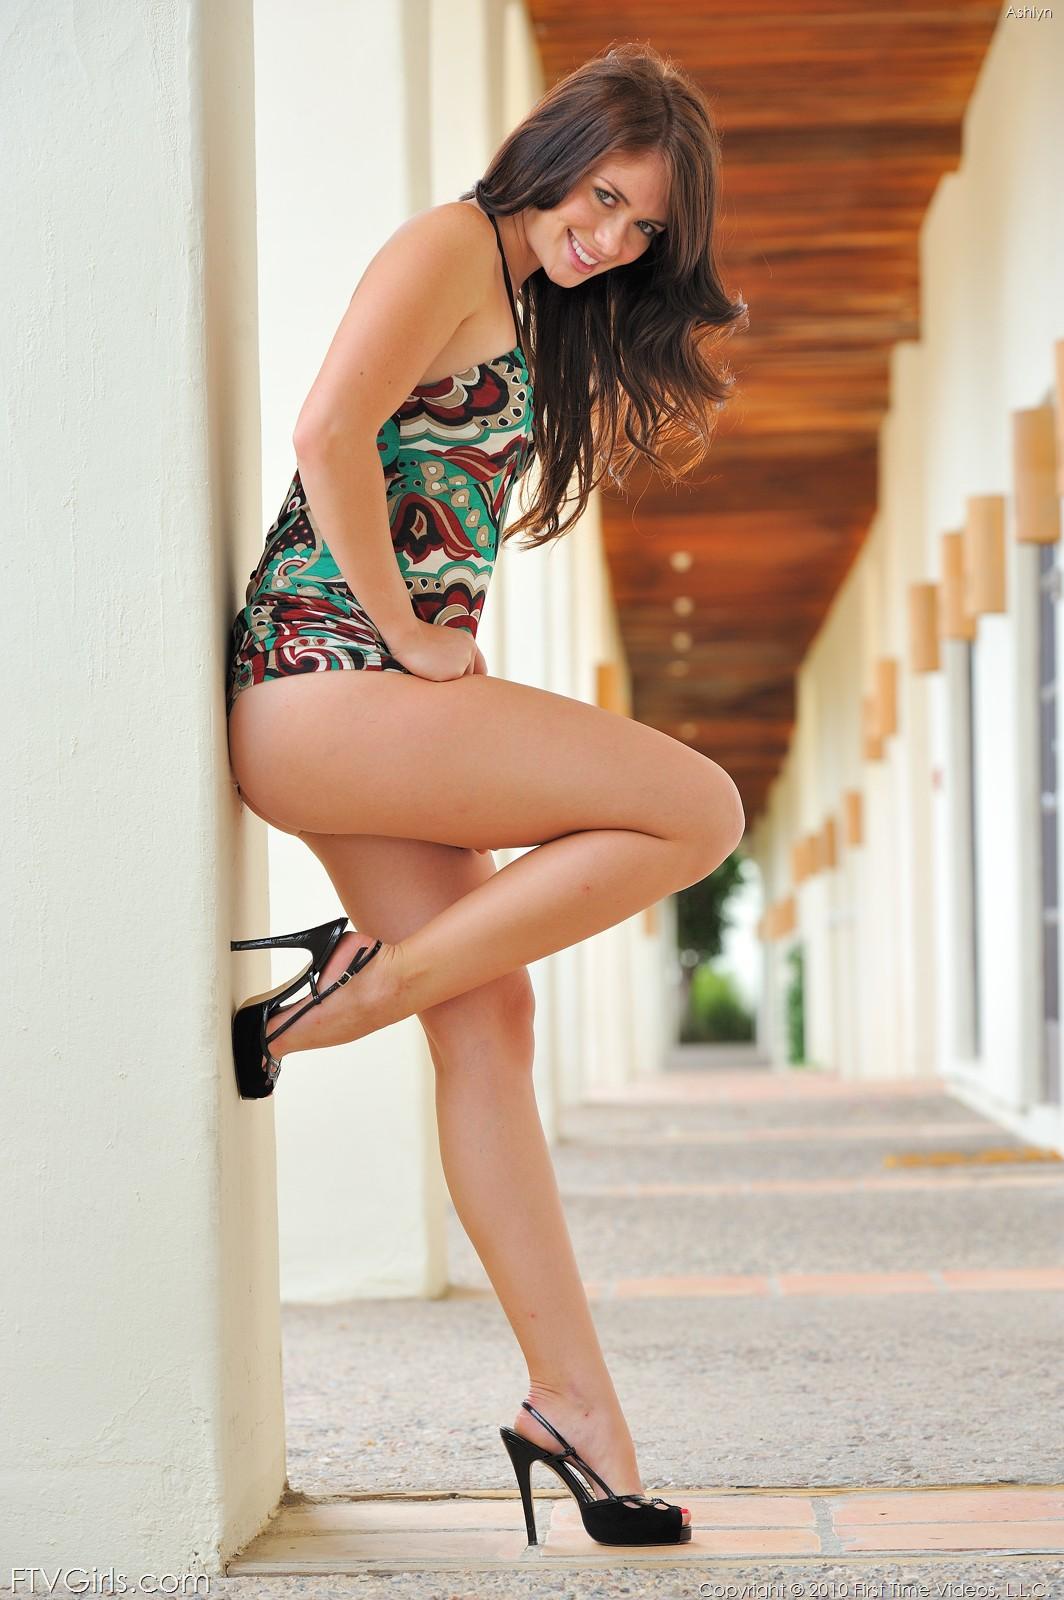 JESSIE: Ftv nude men and women